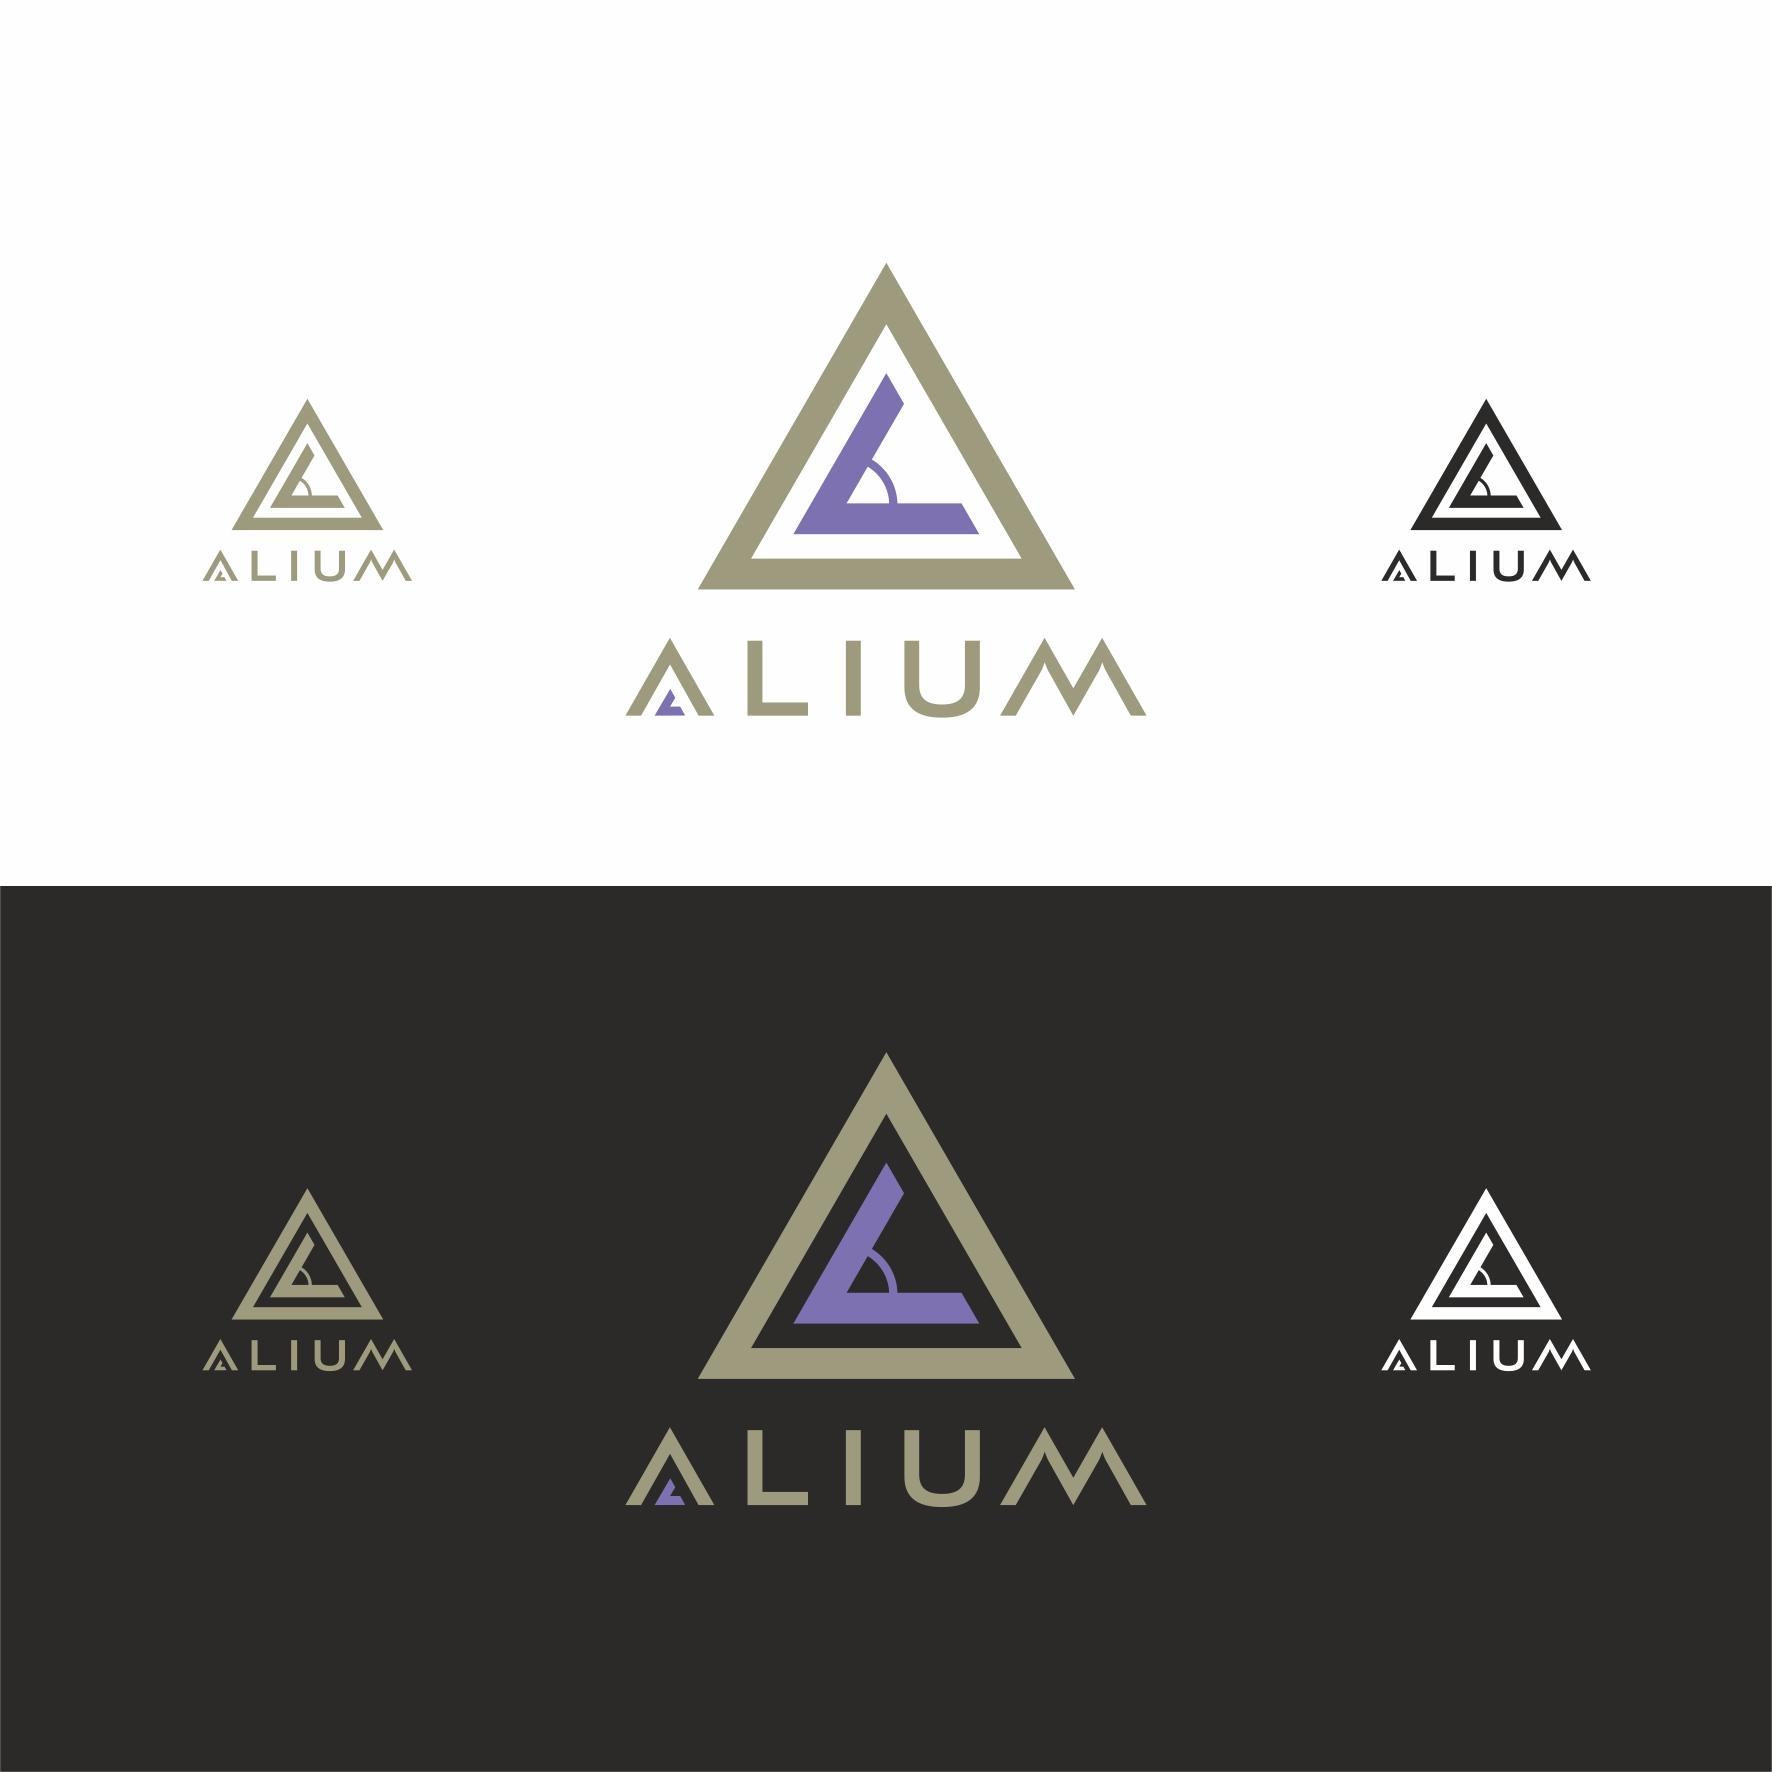 Логотип для дизайн студии фото f_15959e0a20dee522.jpg